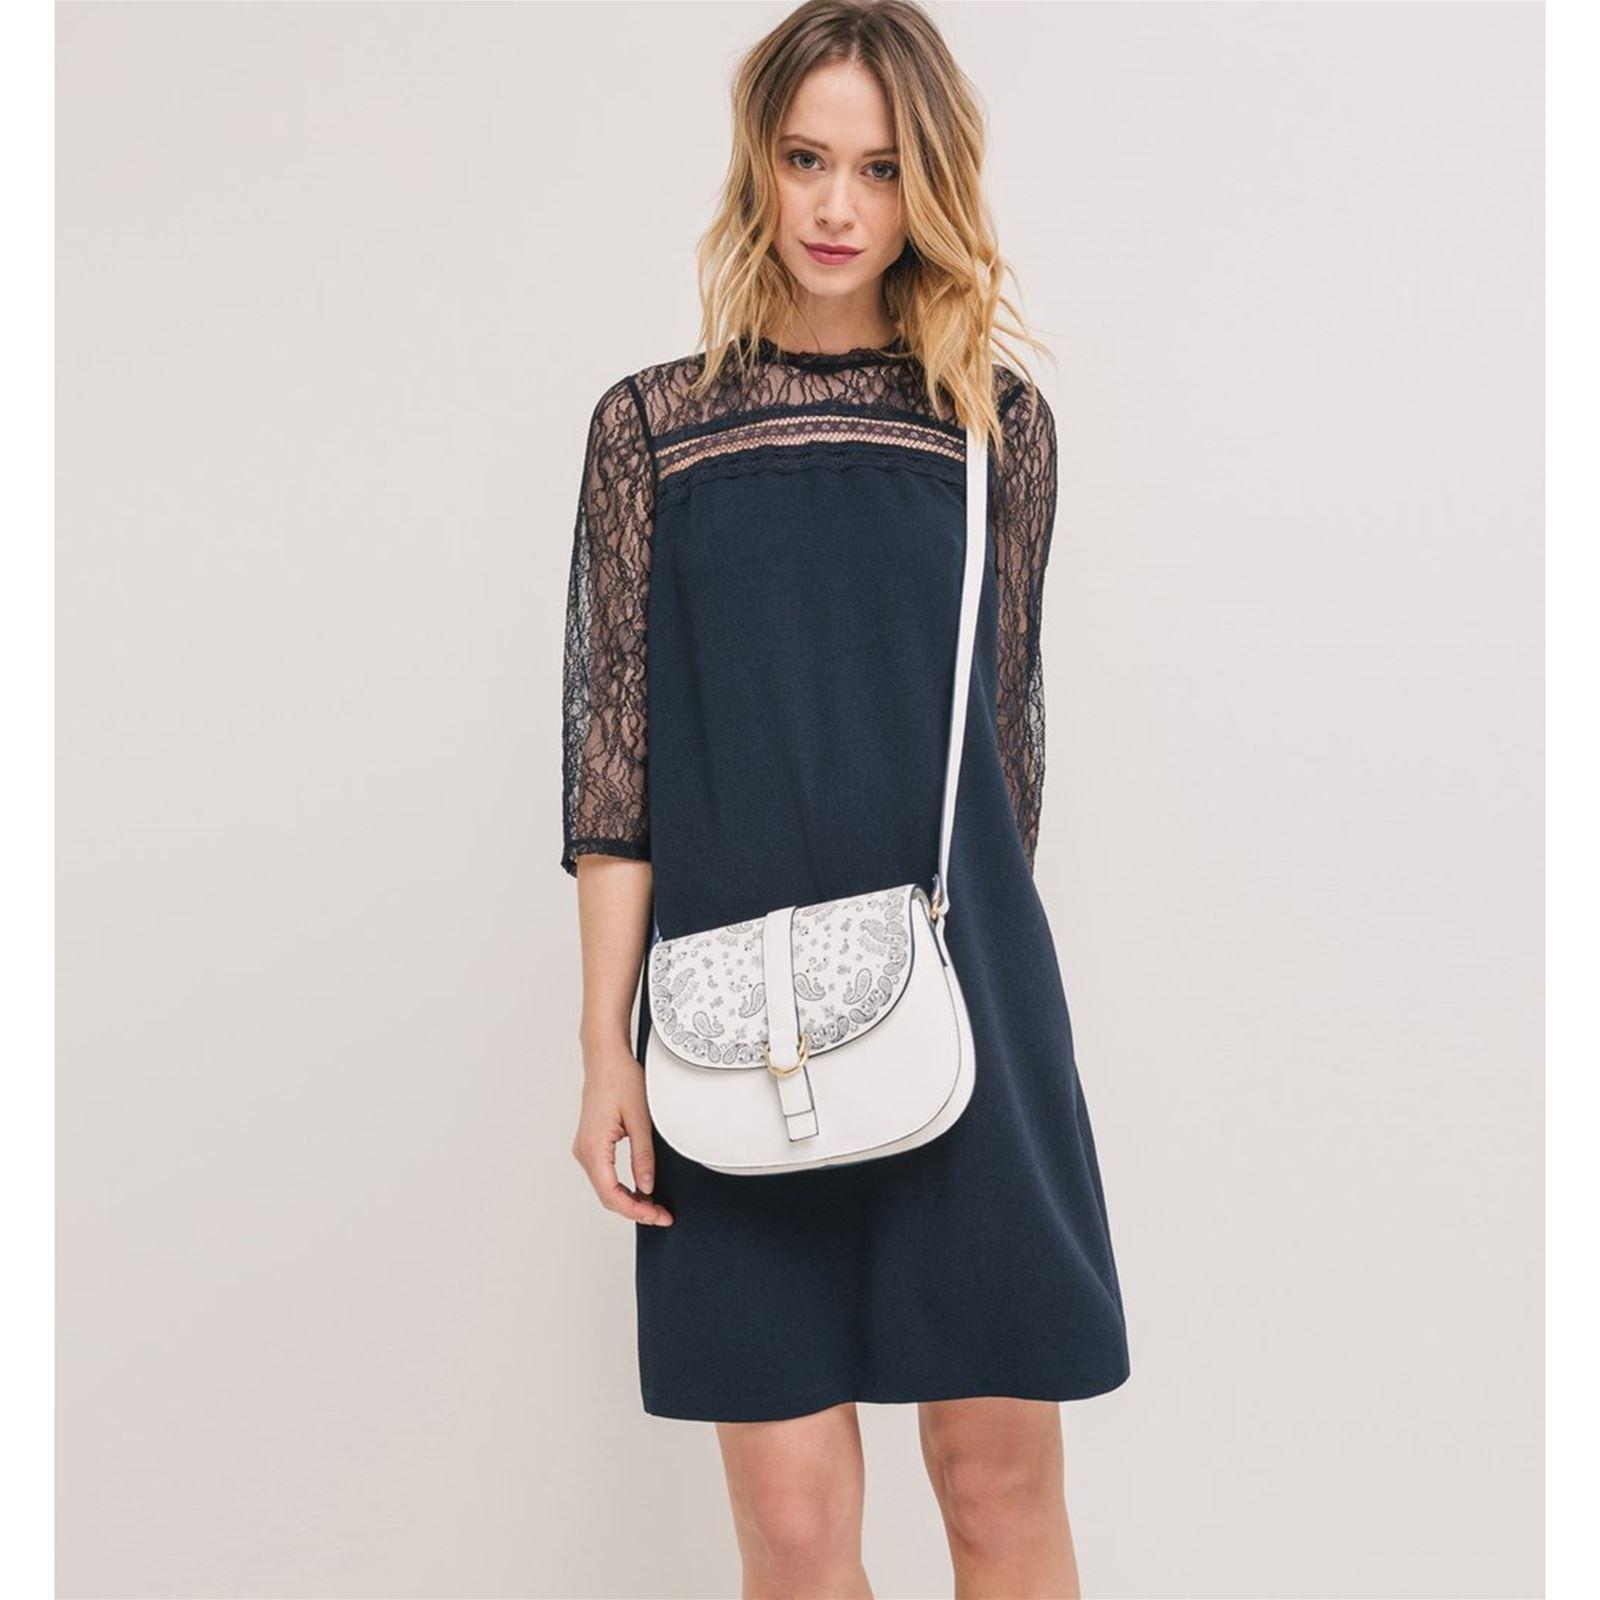 Promod robe bleu marine